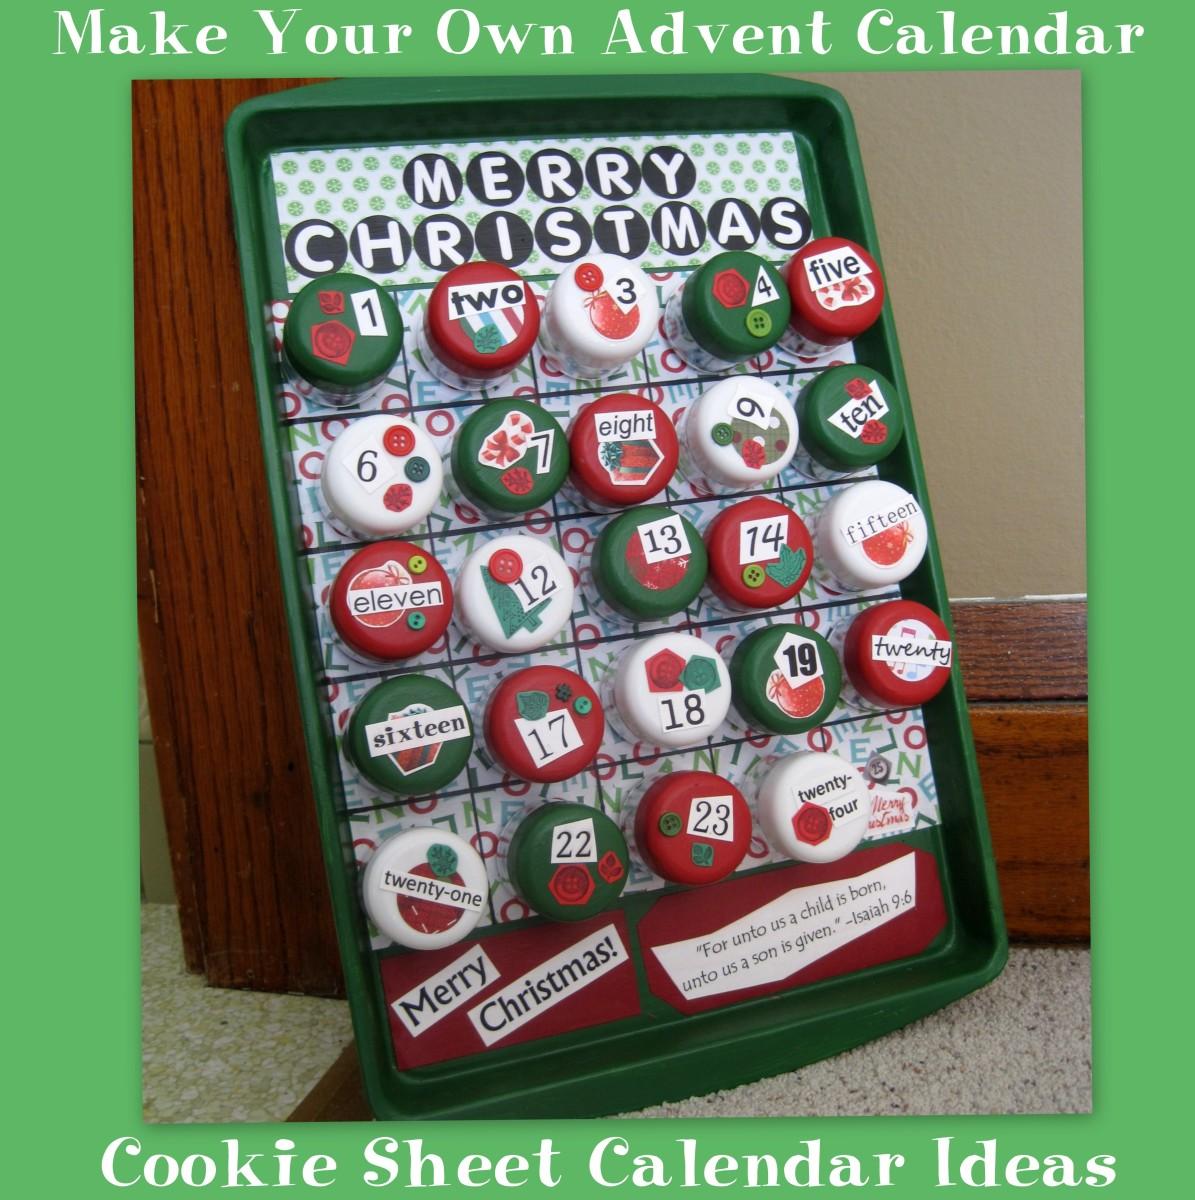 how-to-make-your-own-advent-calendar-cookie-sheet-calendar-craft-ideas